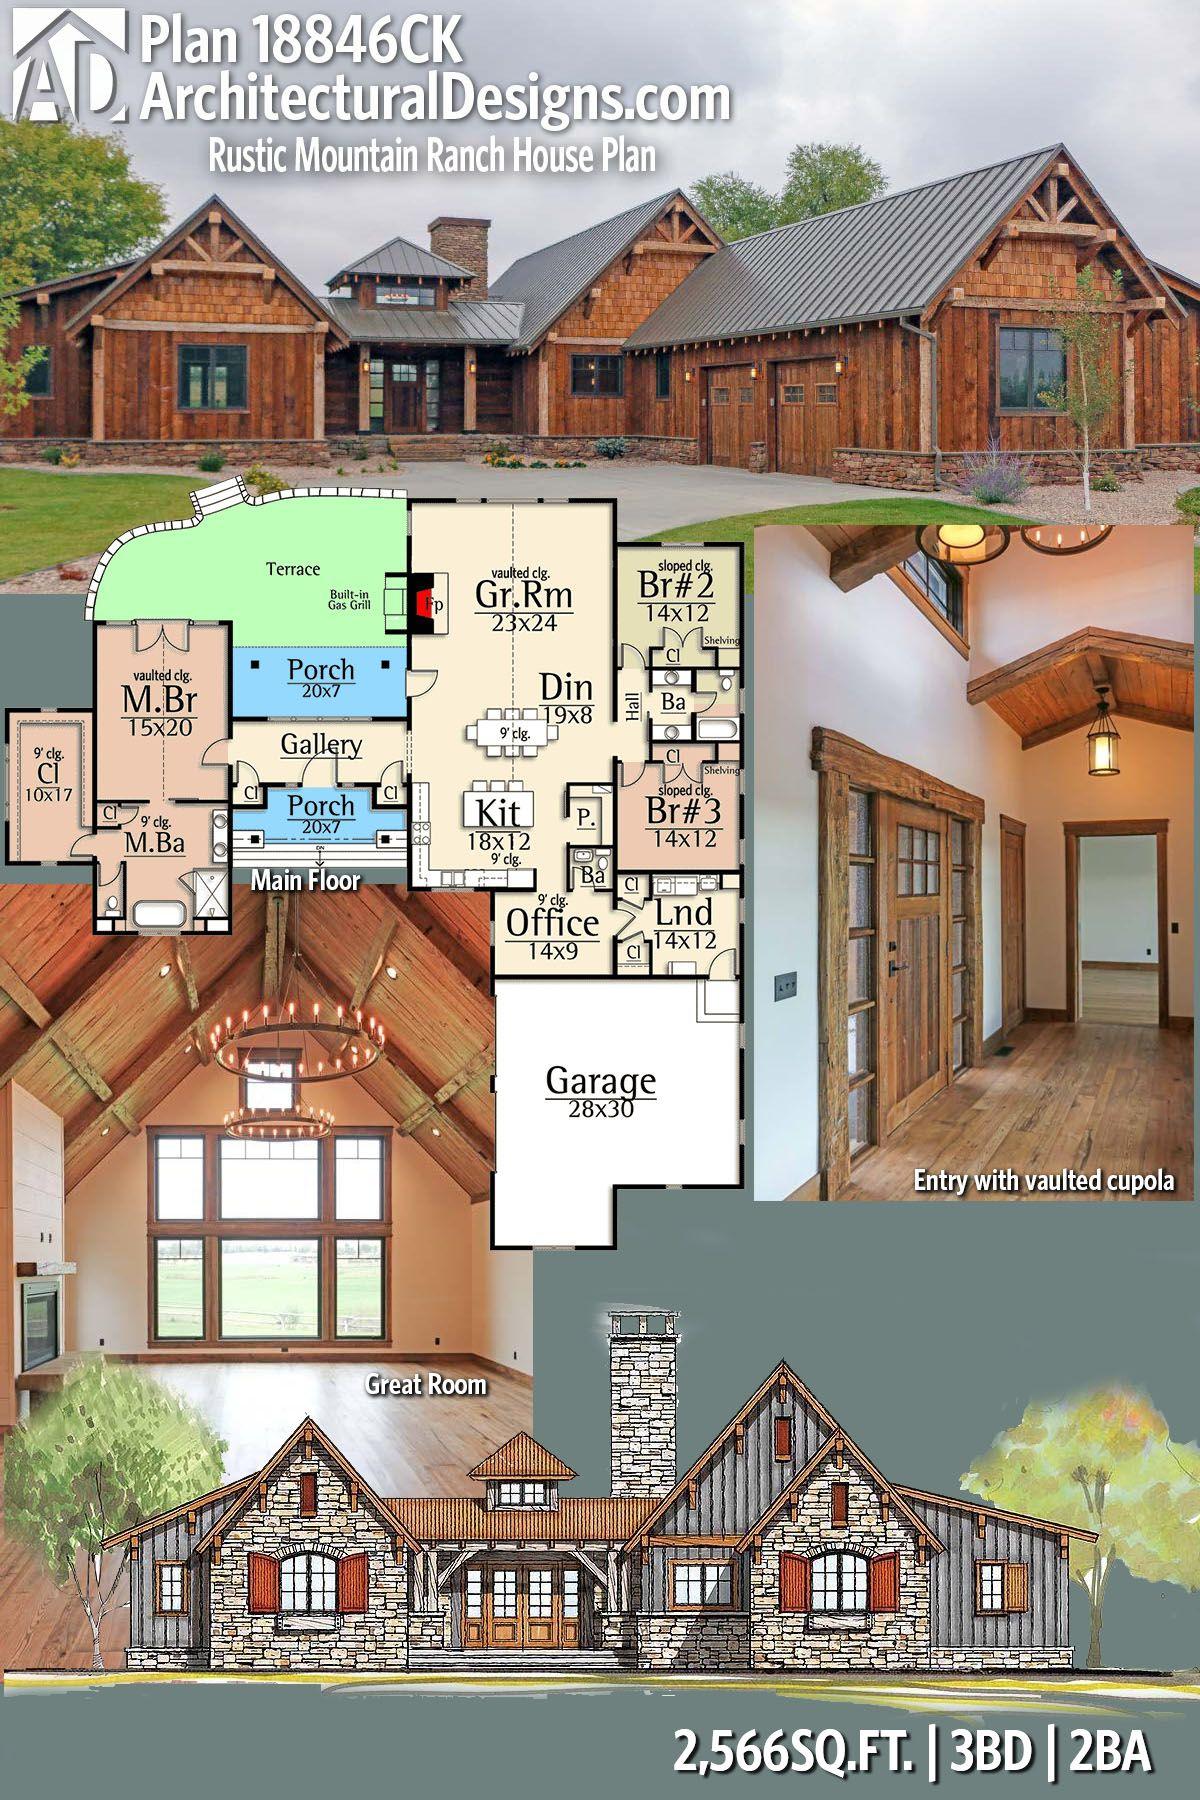 Plan 18846ck Rustic Mountain Ranch House Plan Mountain House Plans Mountain Ranch House Plans Rustic House Plans